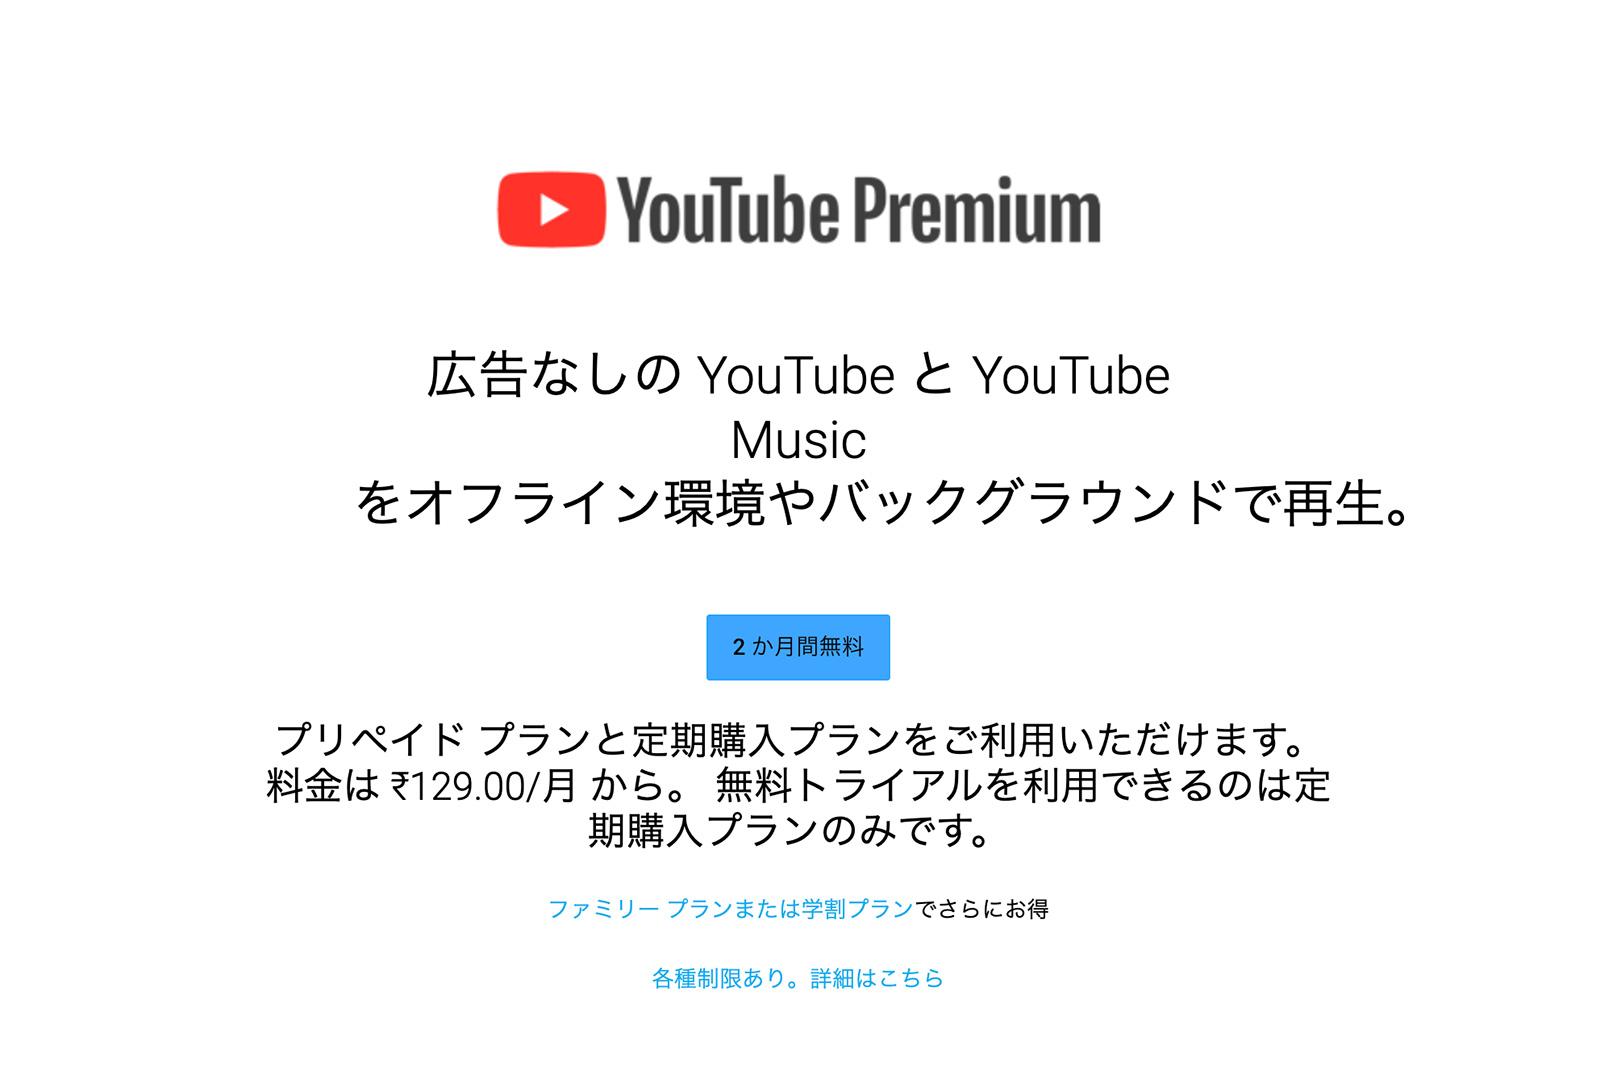 YouTube(ユーチューブ)プレミアムインドの価格